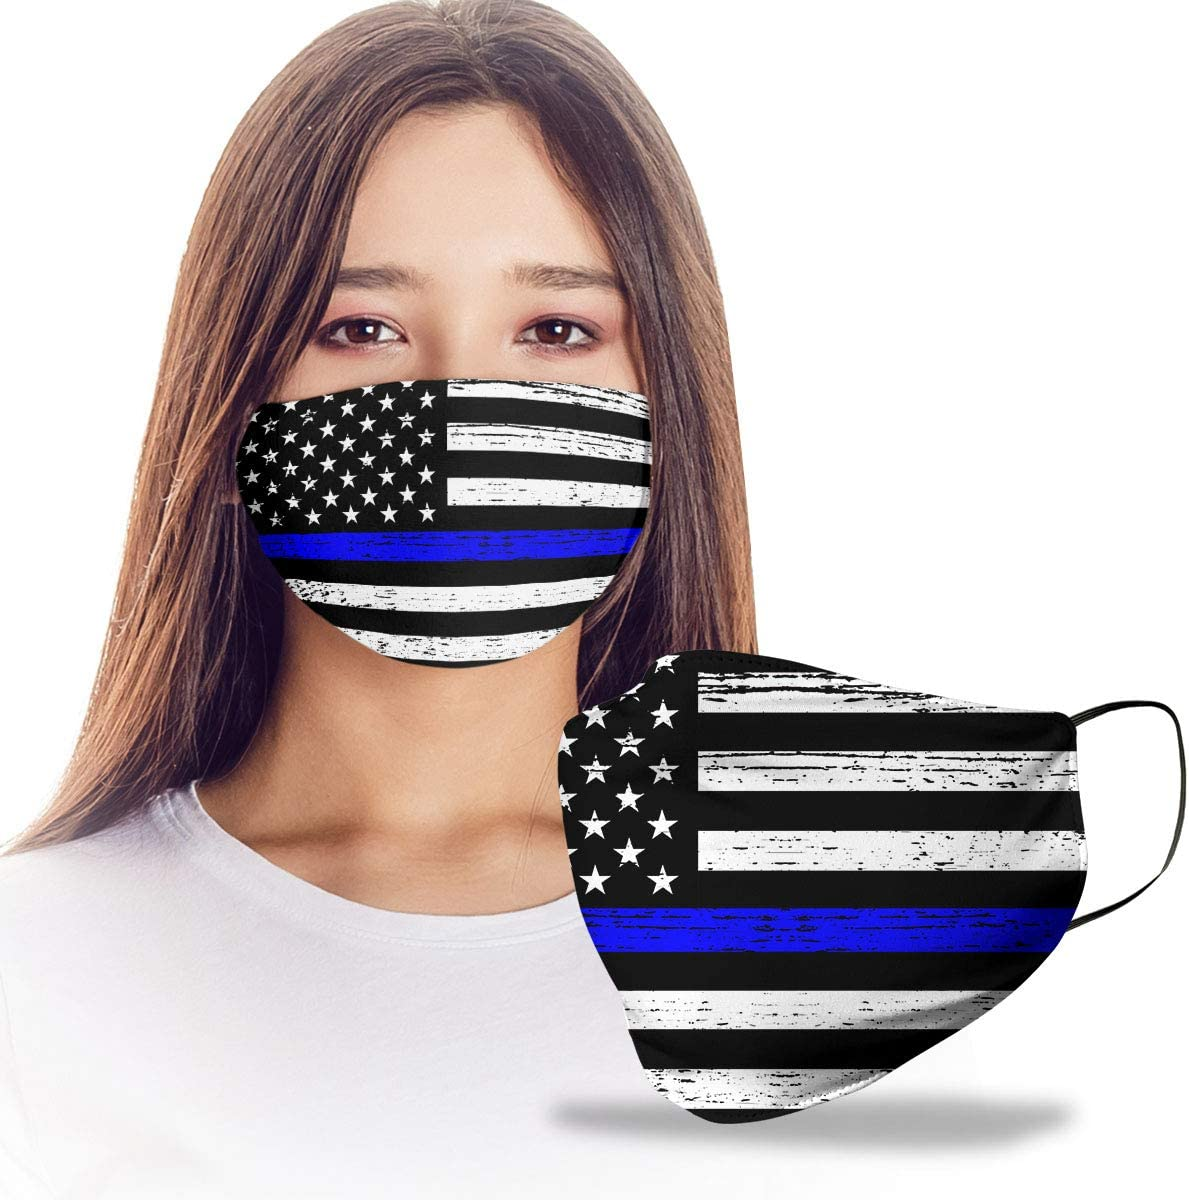 VTH Global Police Officer Thin Blue Line Lives Matter American Flag Law Enforcement Deputy Sheriff Reusable Washable Face Mask Women Men for Dust Protection